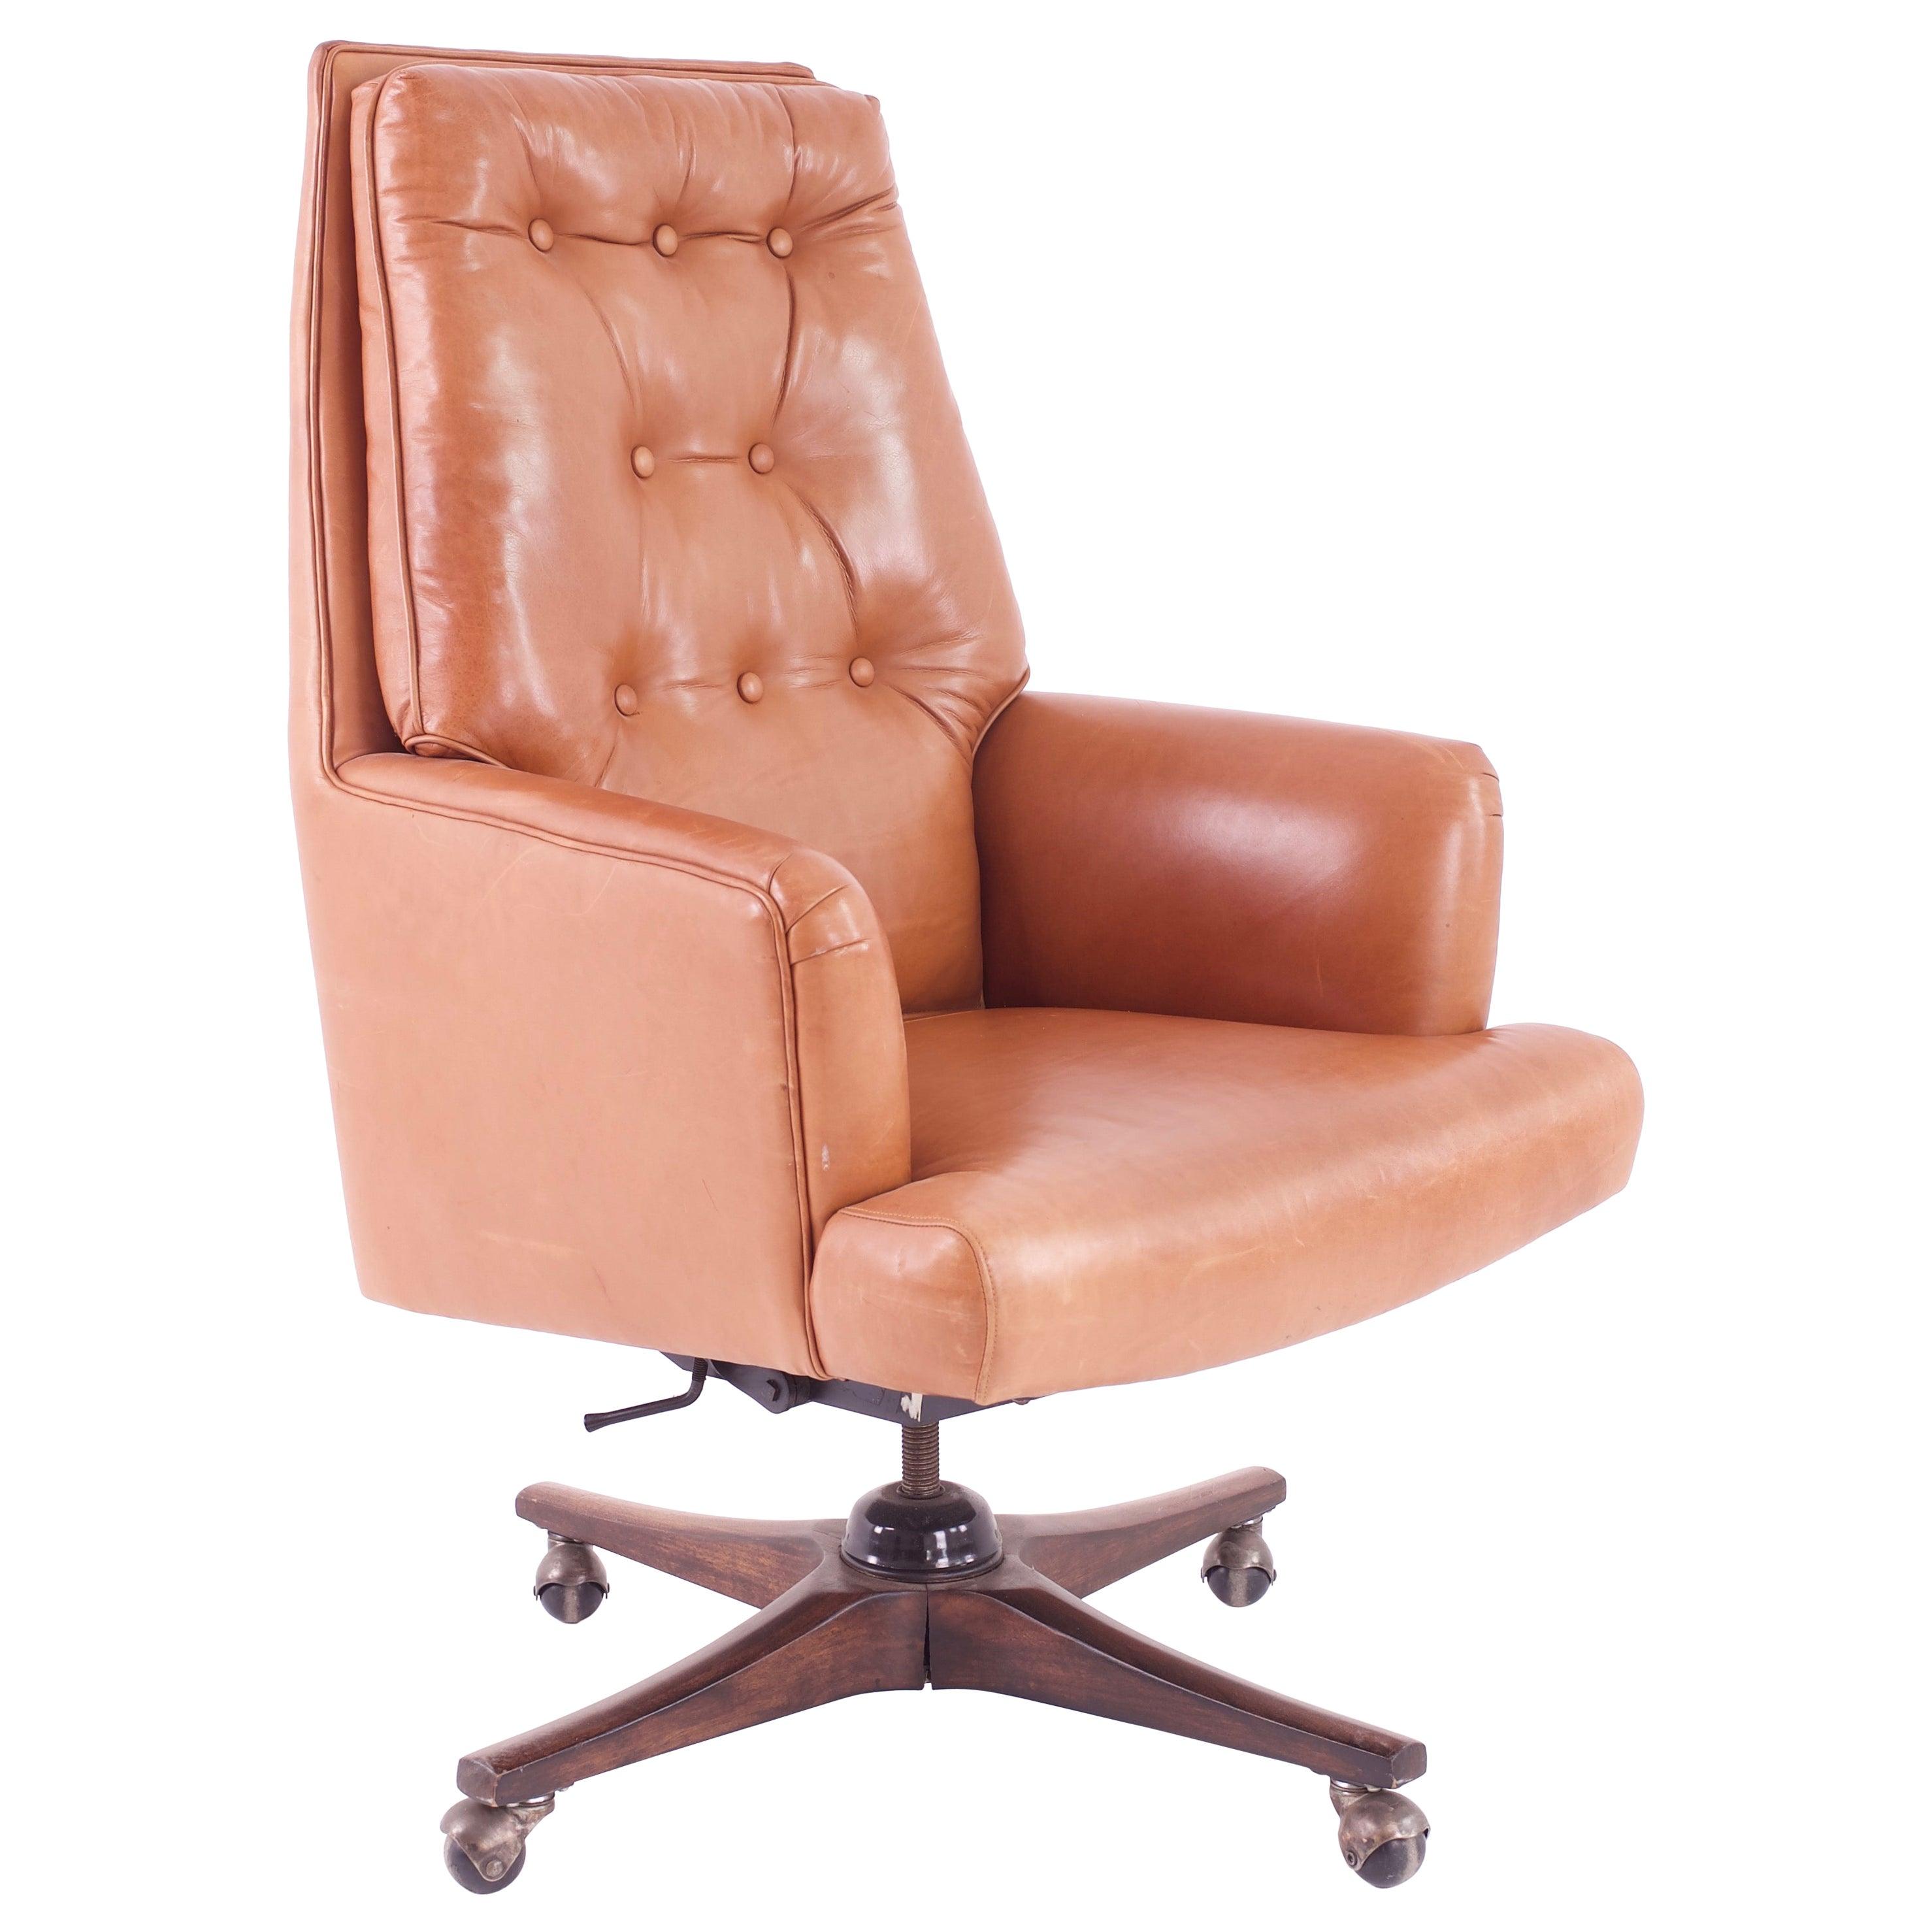 Edward Wormley for Dunbar Style Mid Century Leather Orange Desk Chair